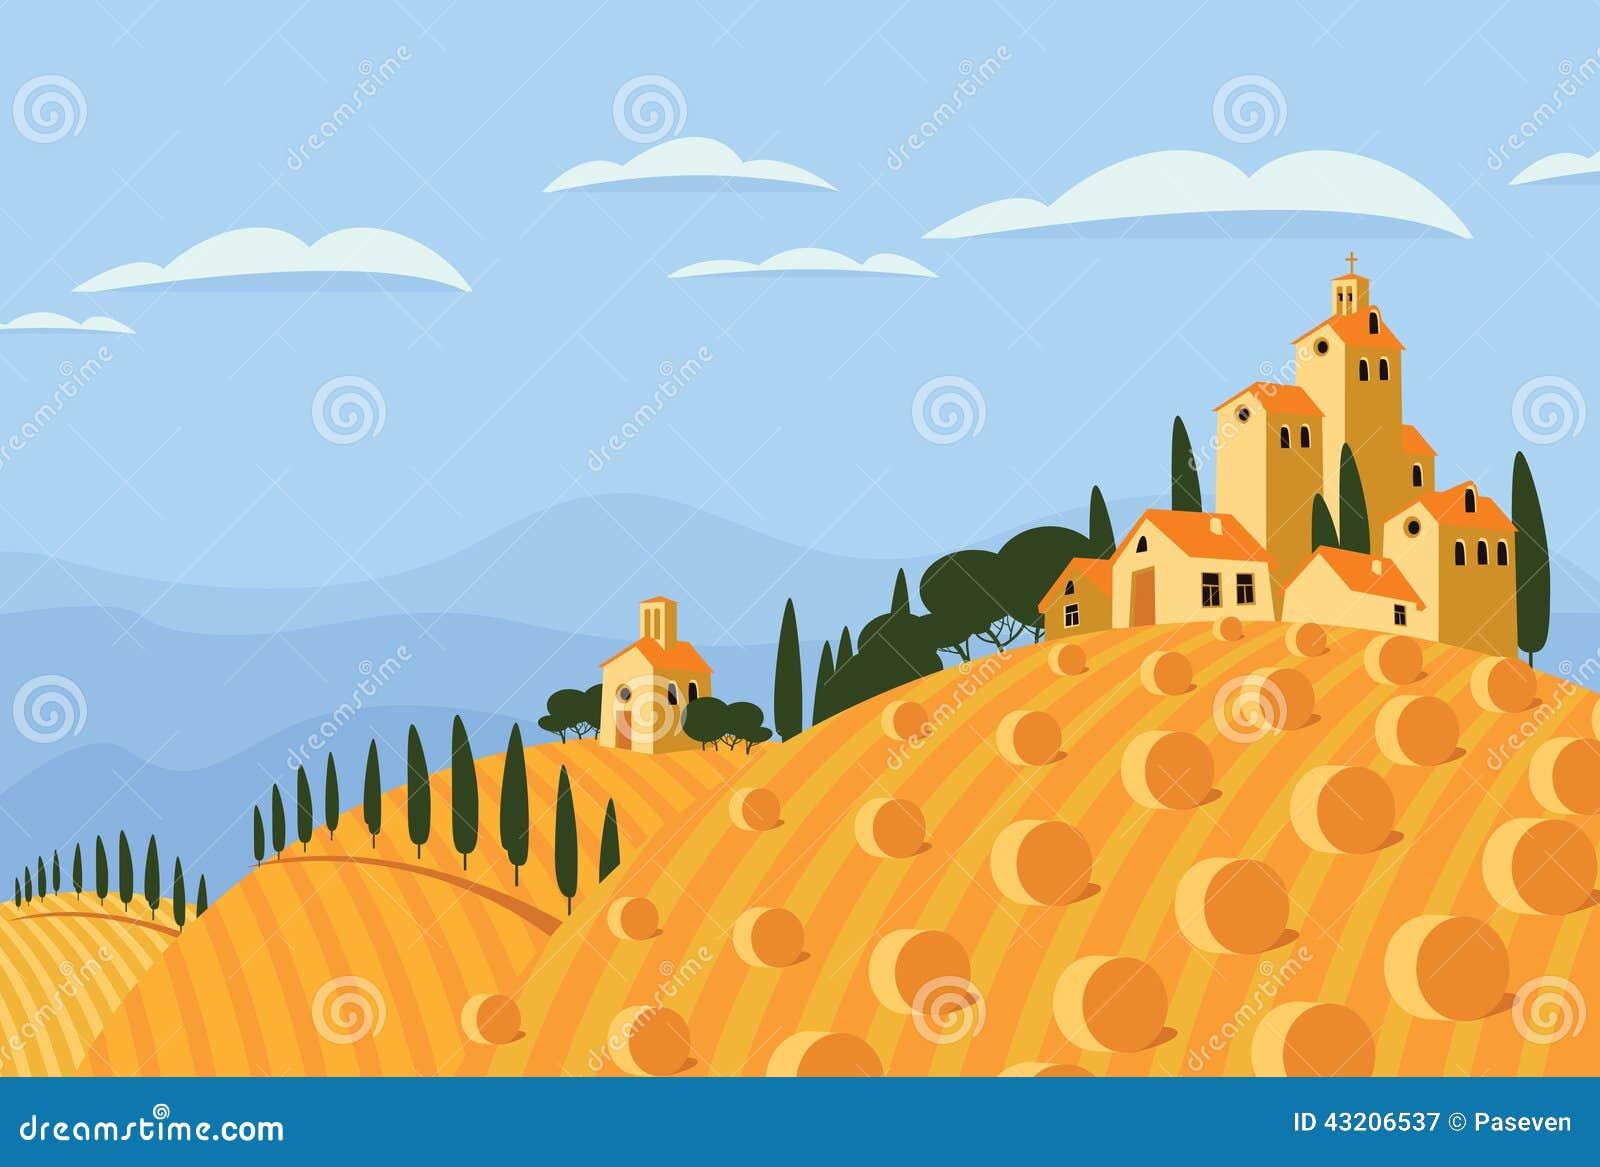 italian scene wallpaper